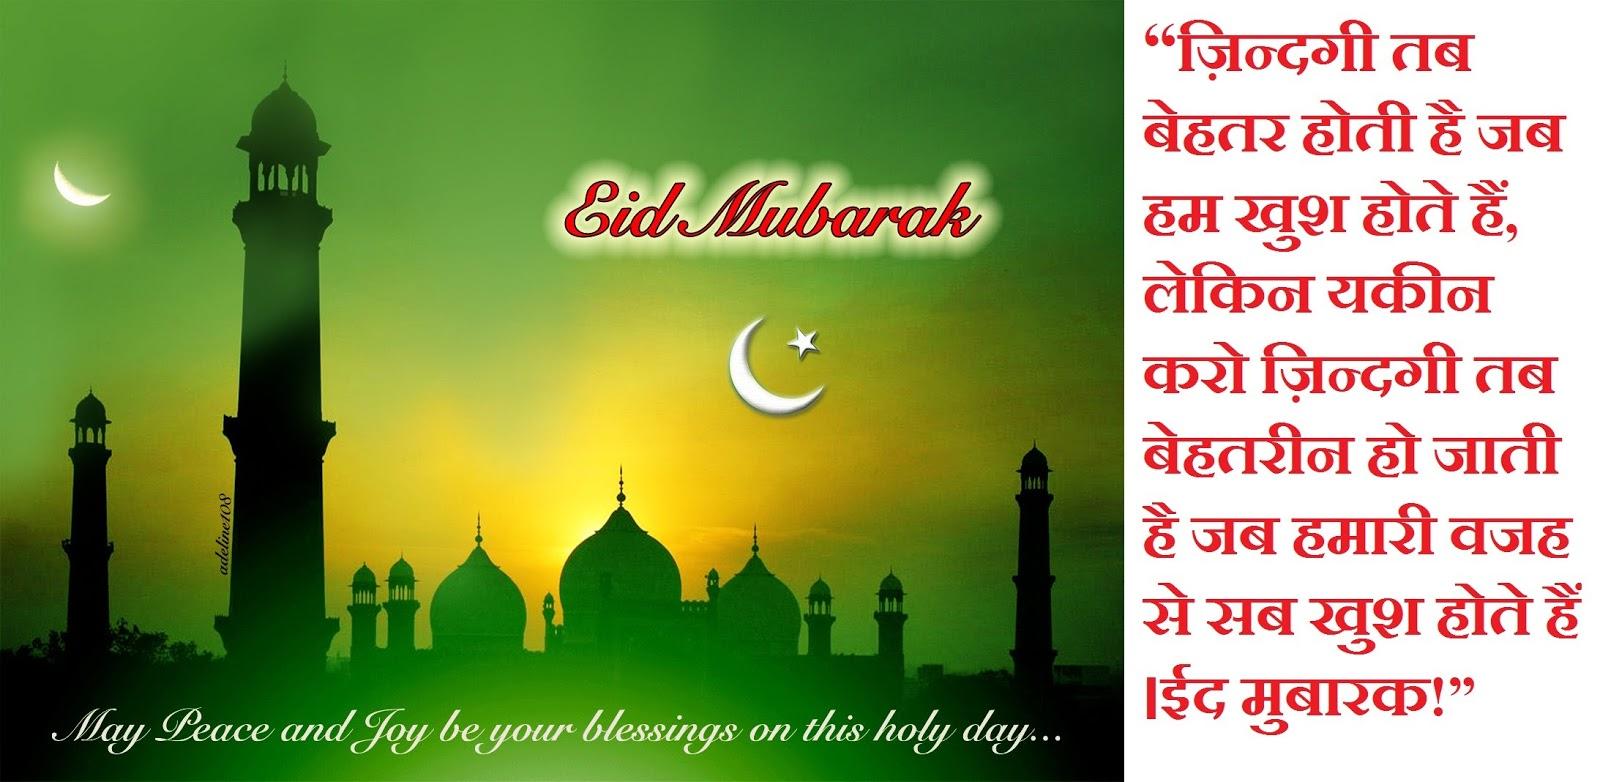 Eid mubarak eid ul adha 2017 greetings messages english and hindi eid mubarak eid ul adha wishes message in hindi 2017 kristyandbryce Images